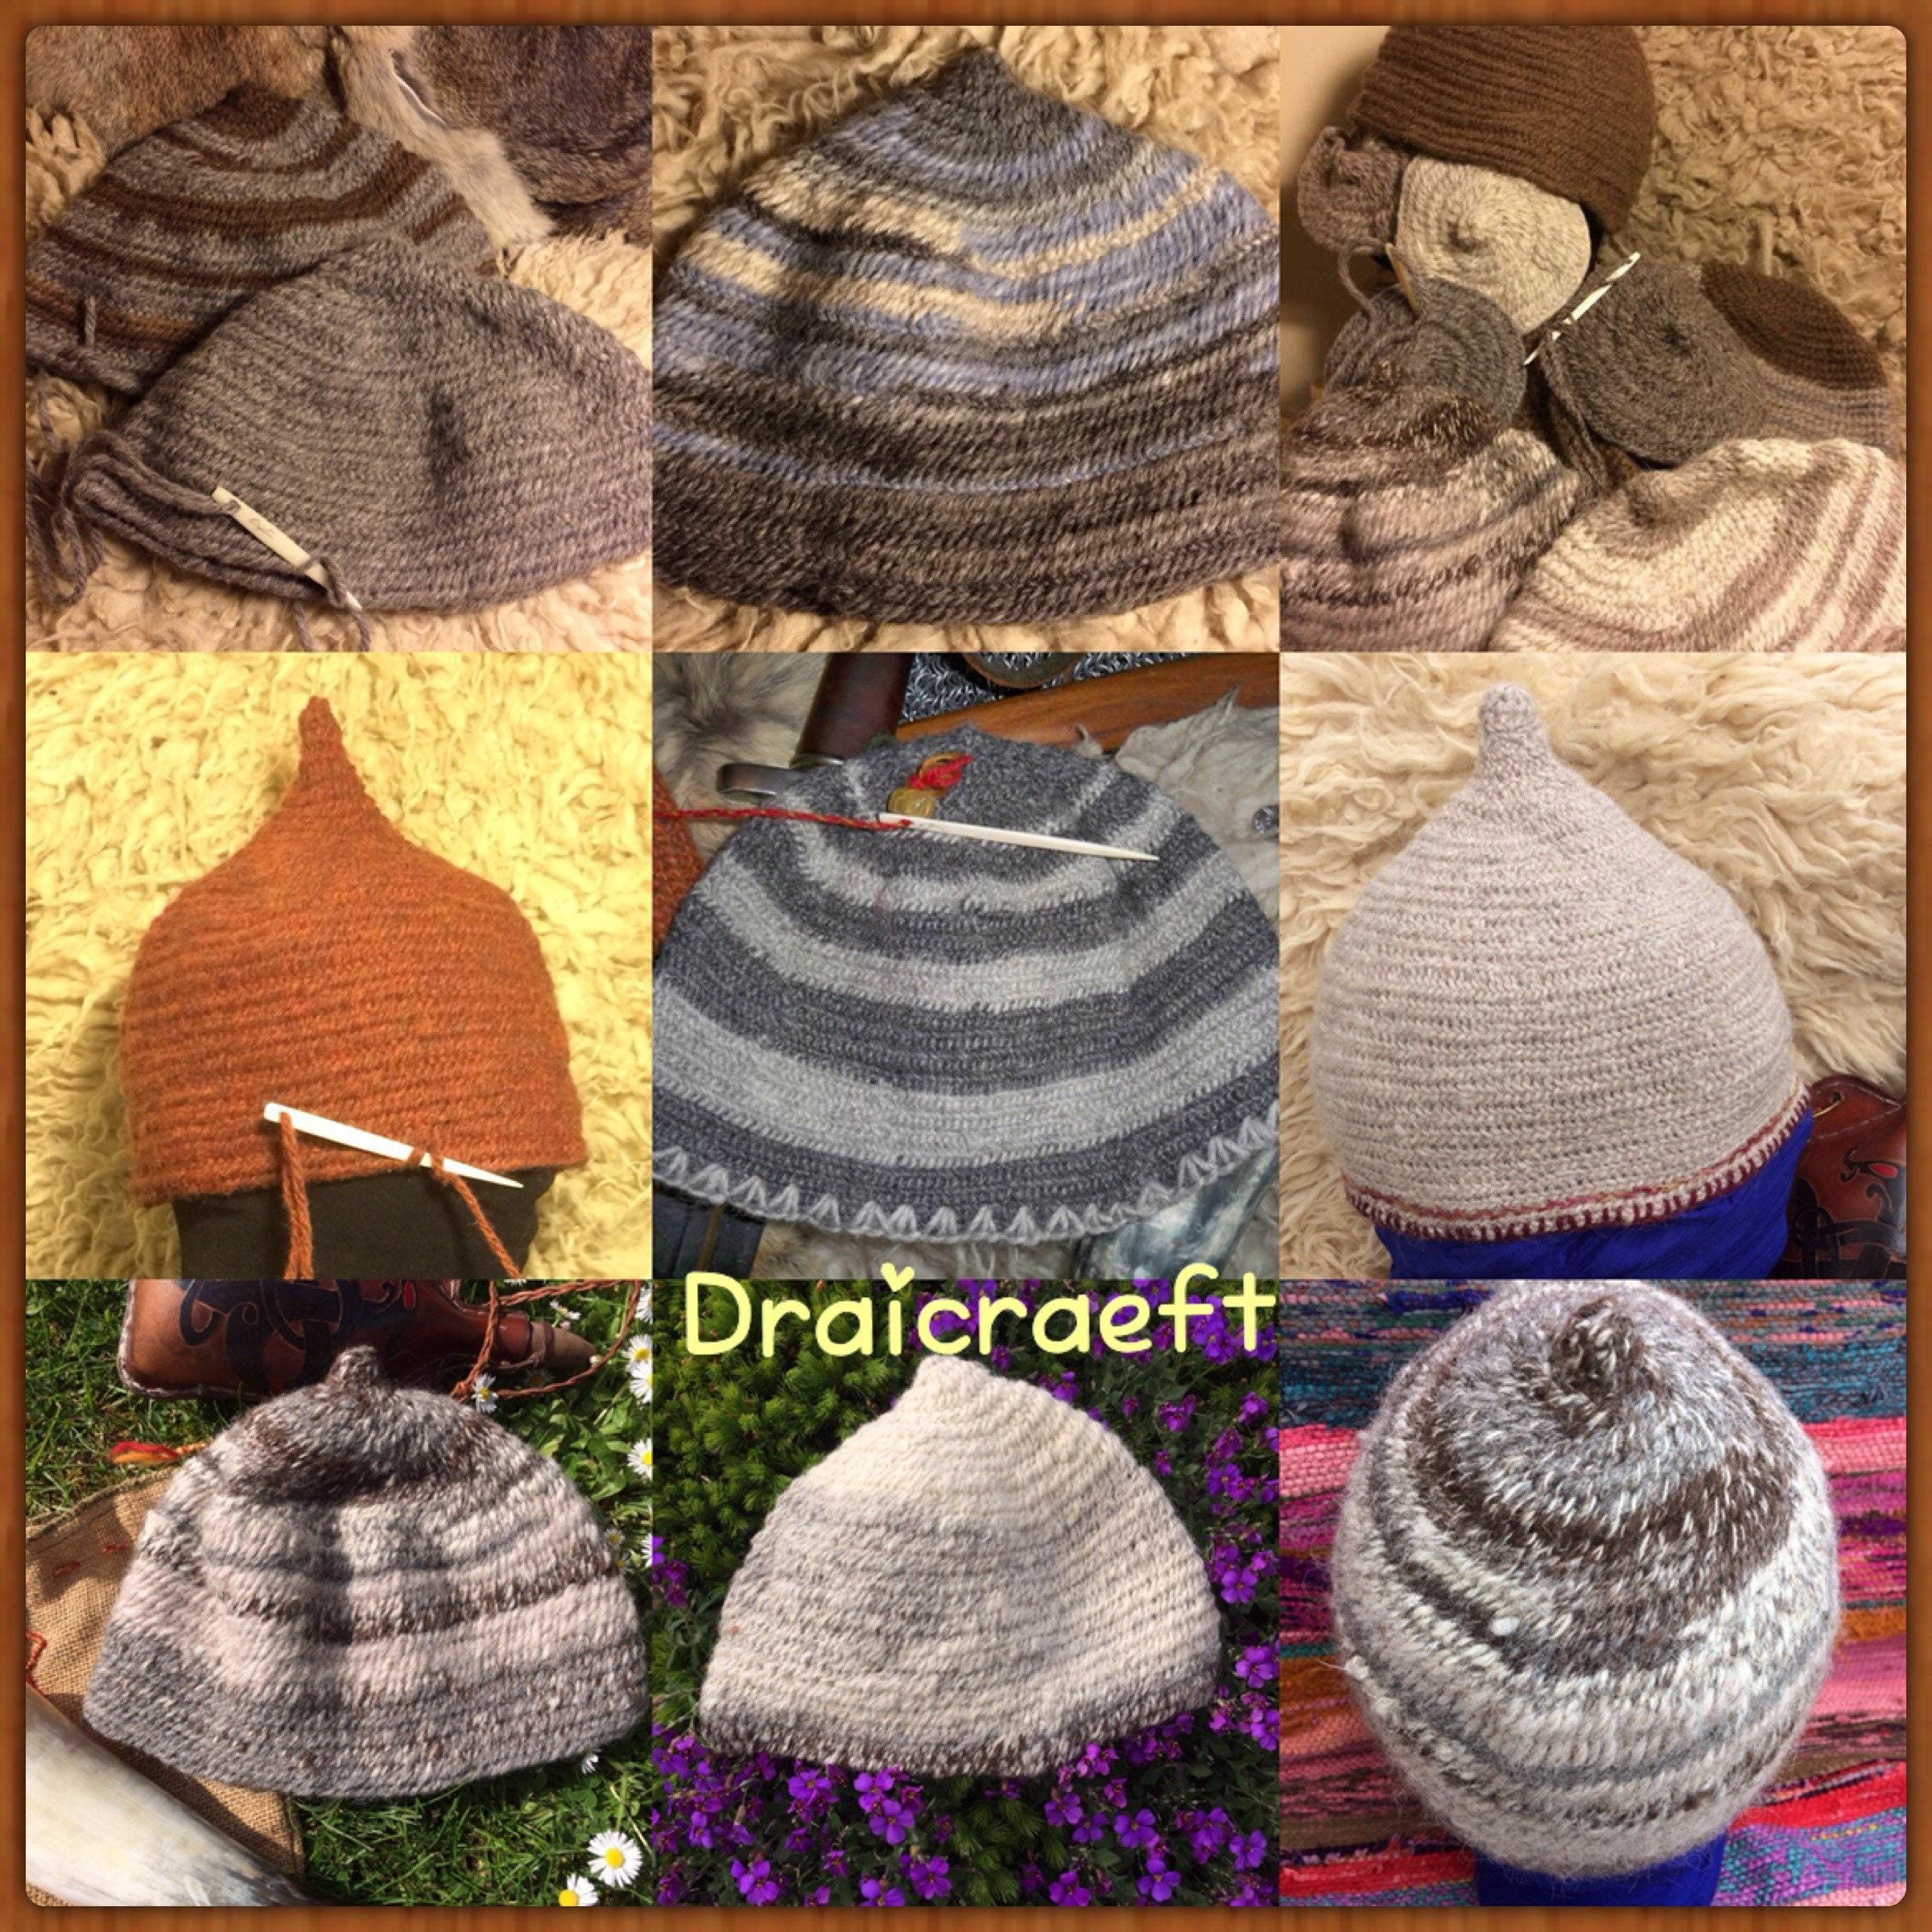 367ef2f5611 Viking wool handmade Nålebinding hats in quality rare breed sheep wools